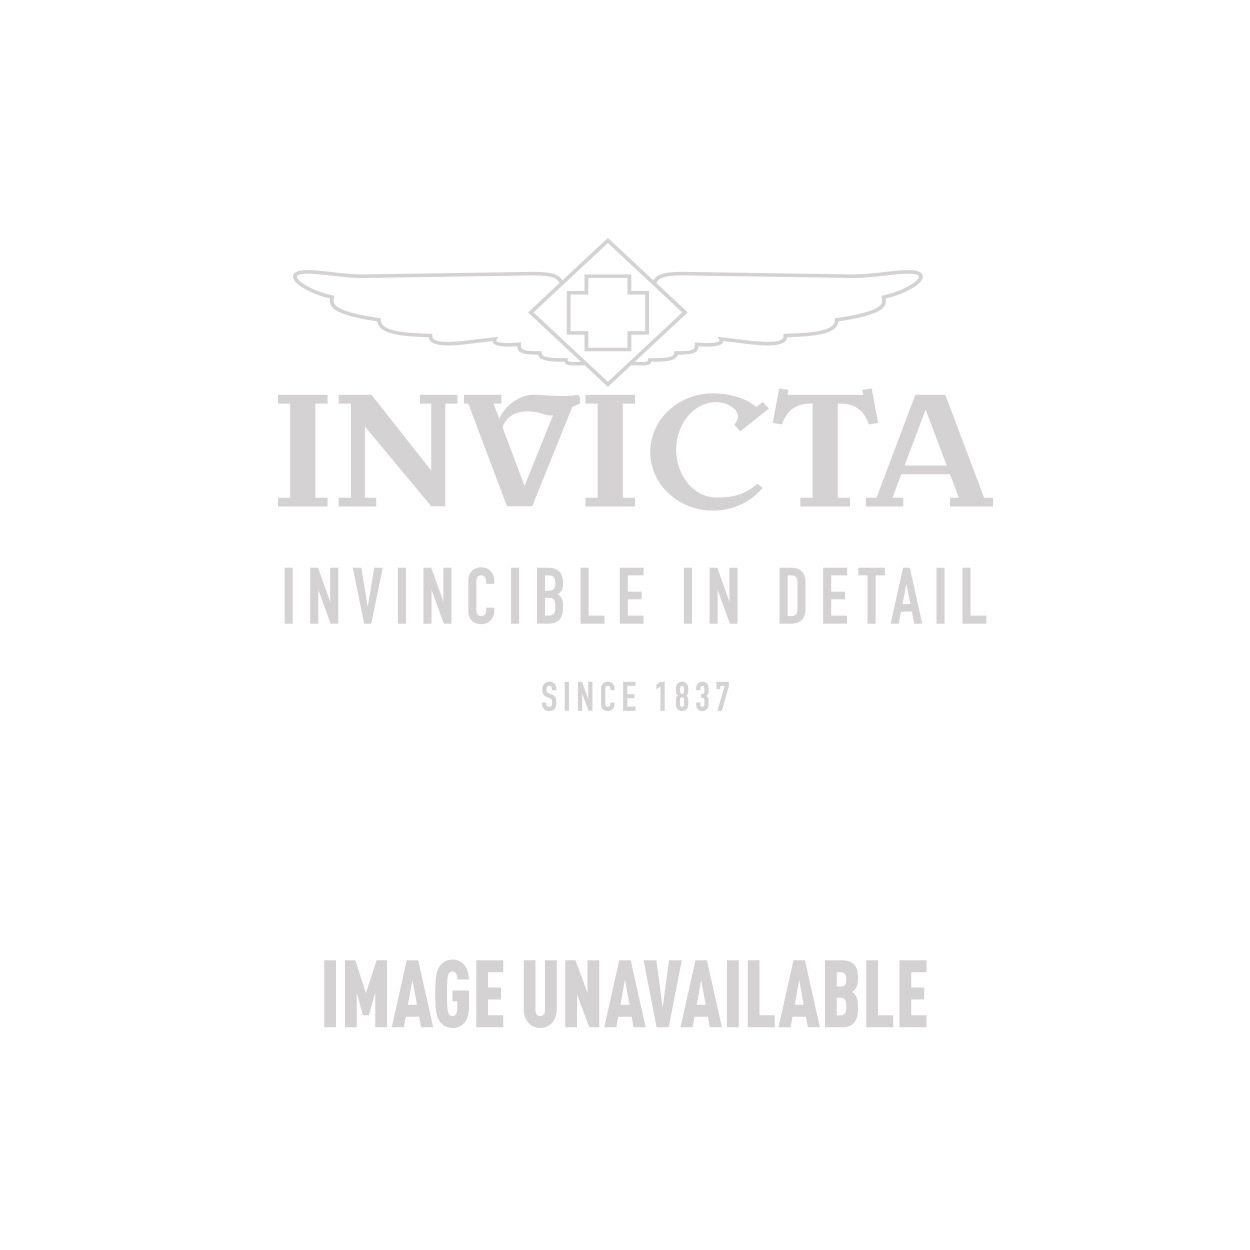 Invicta Akula Swiss Made Quartz Watch - Gunmetal case with Pink tone Silicone band - Model 12019